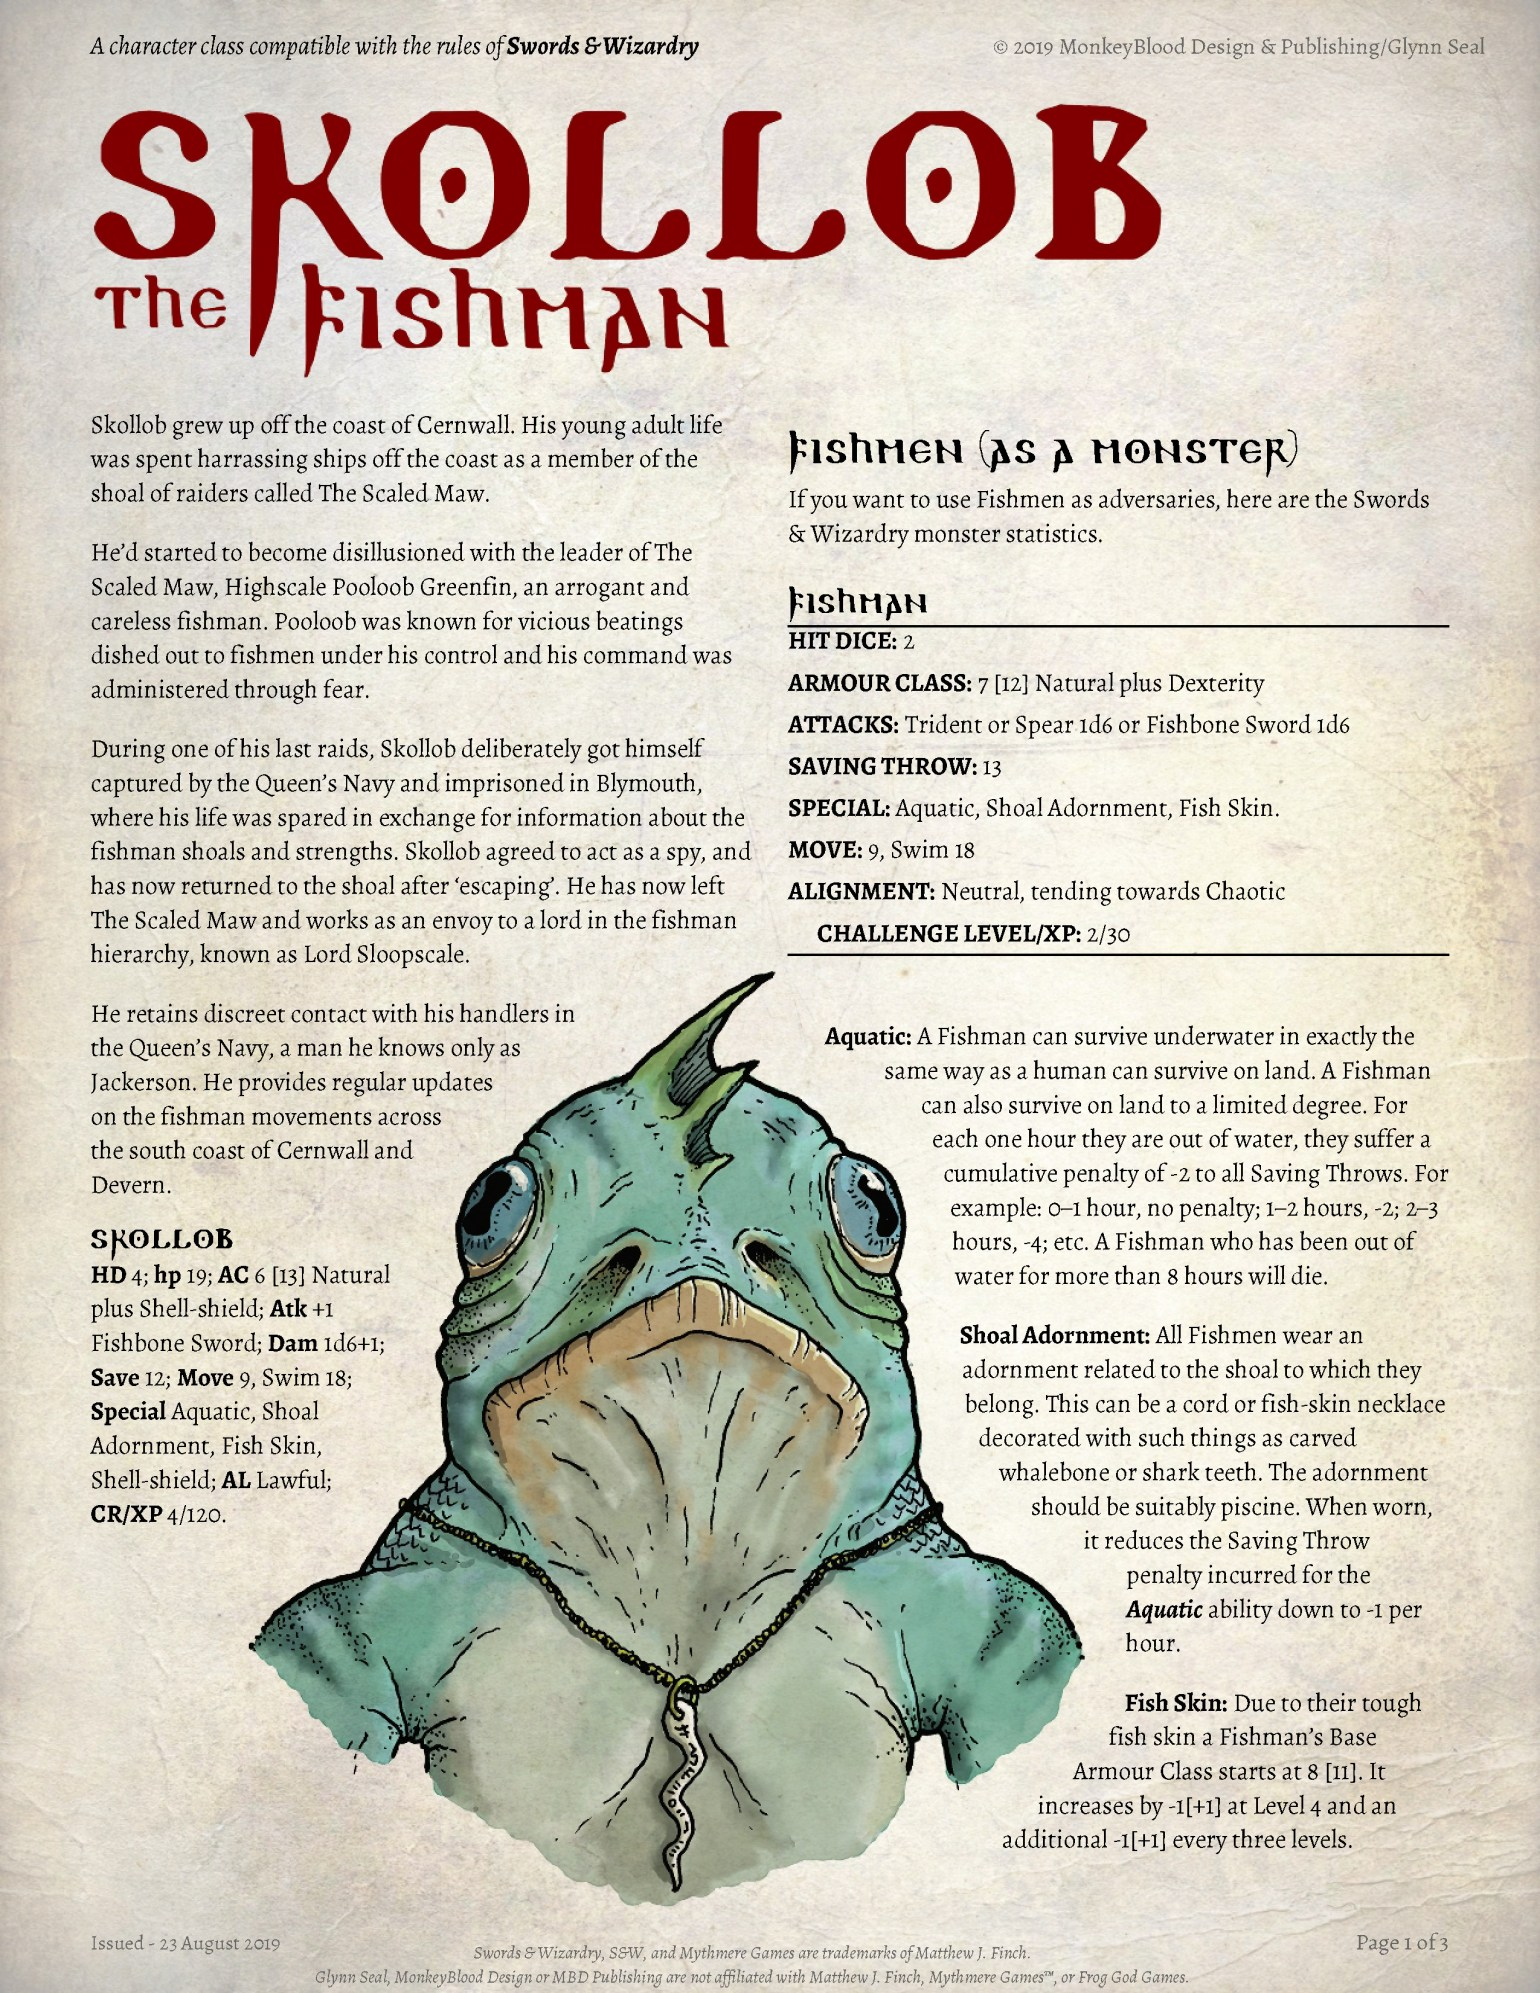 Fishman S&W 2019-08-23_Page_1.jpg